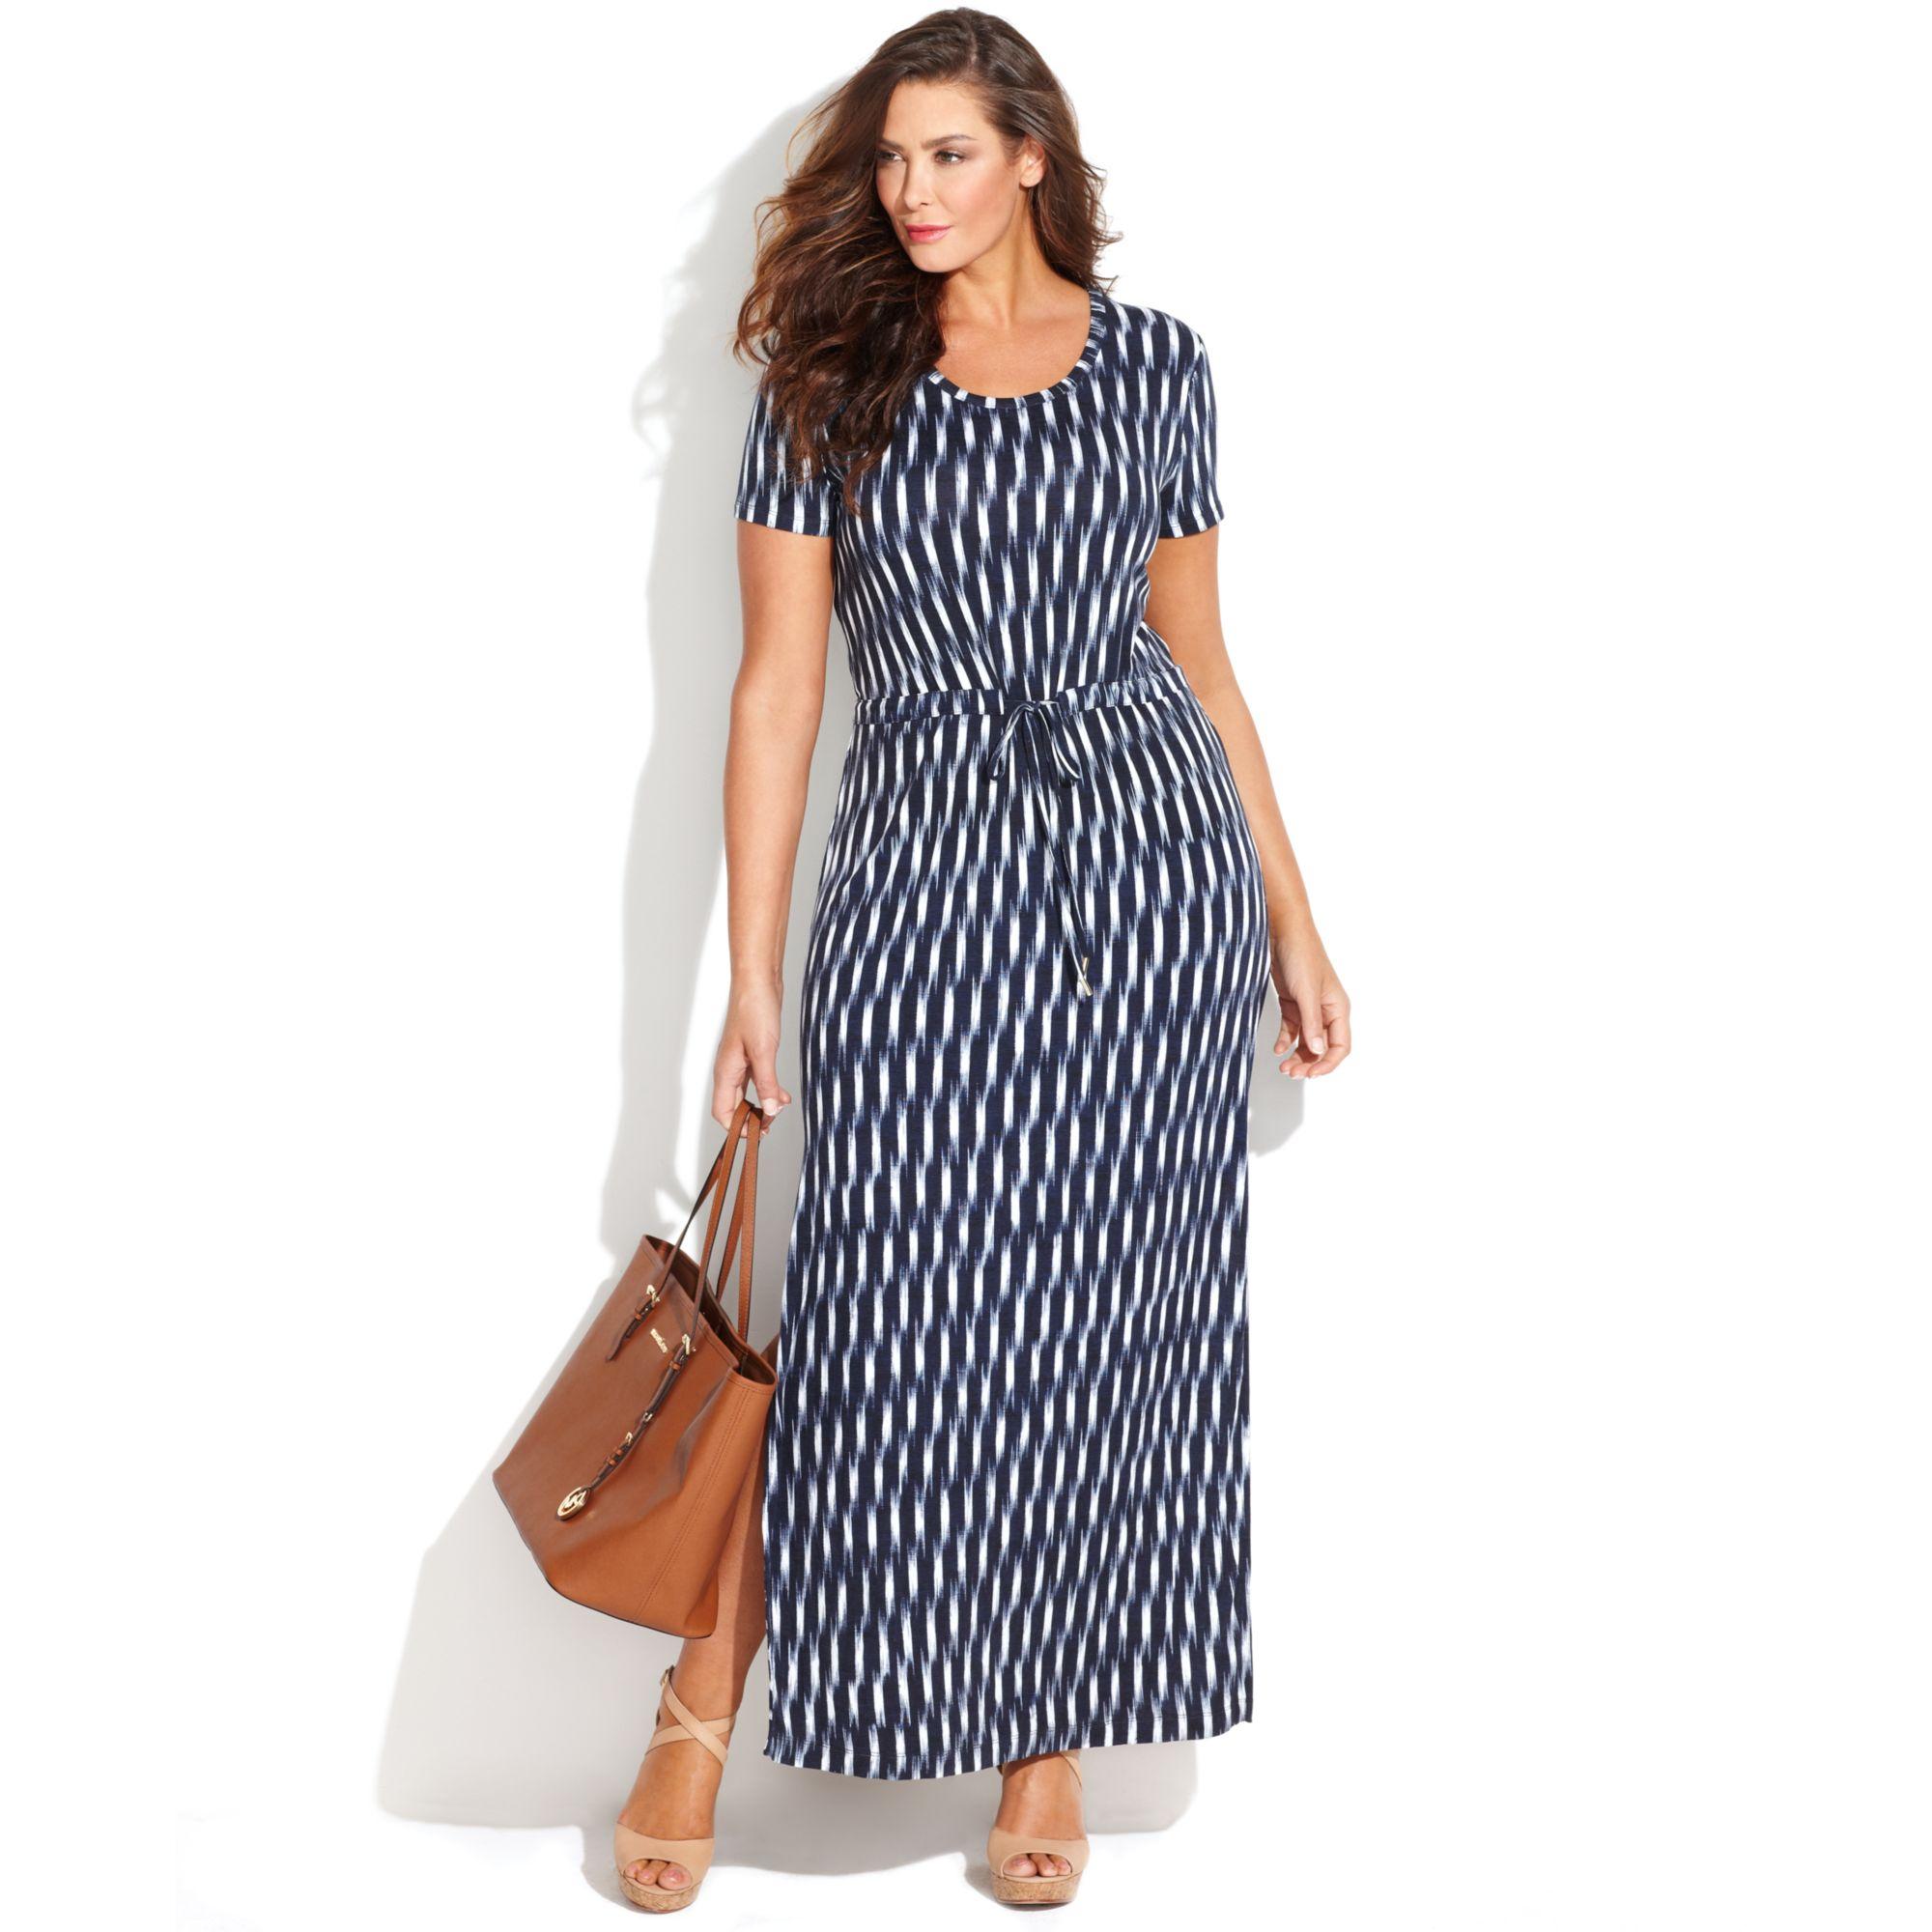 Michael Plus Size Shortsleeve Printed Maxi Dress